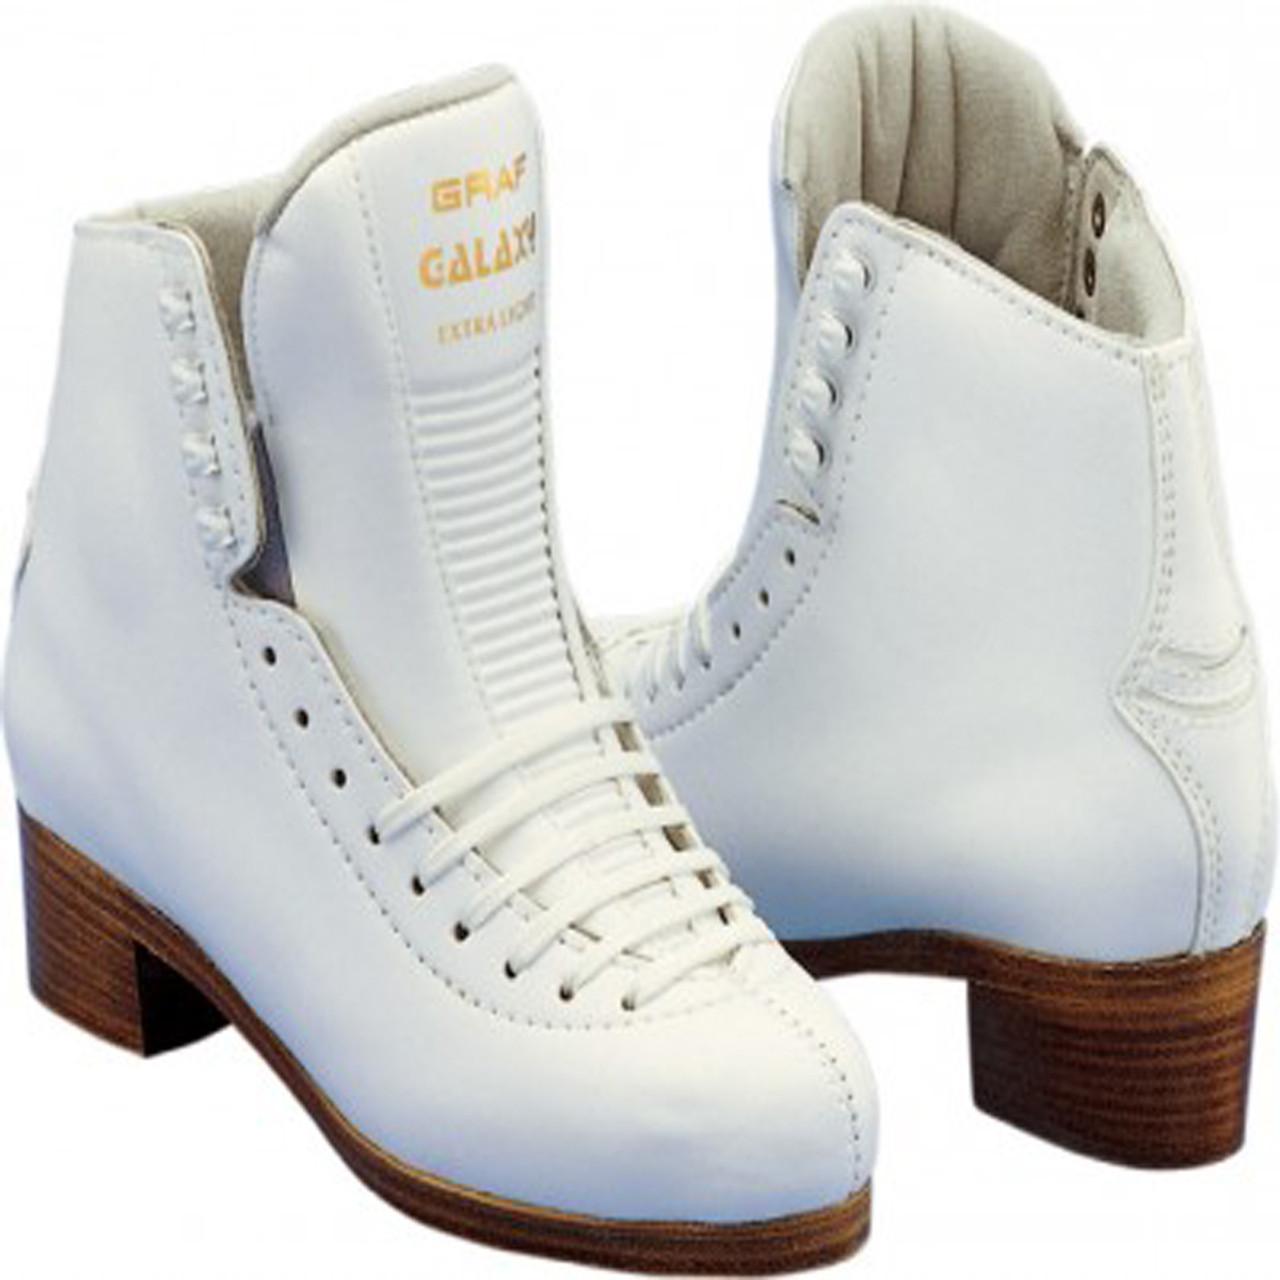 Graf Galaxy Figure Skate Boot